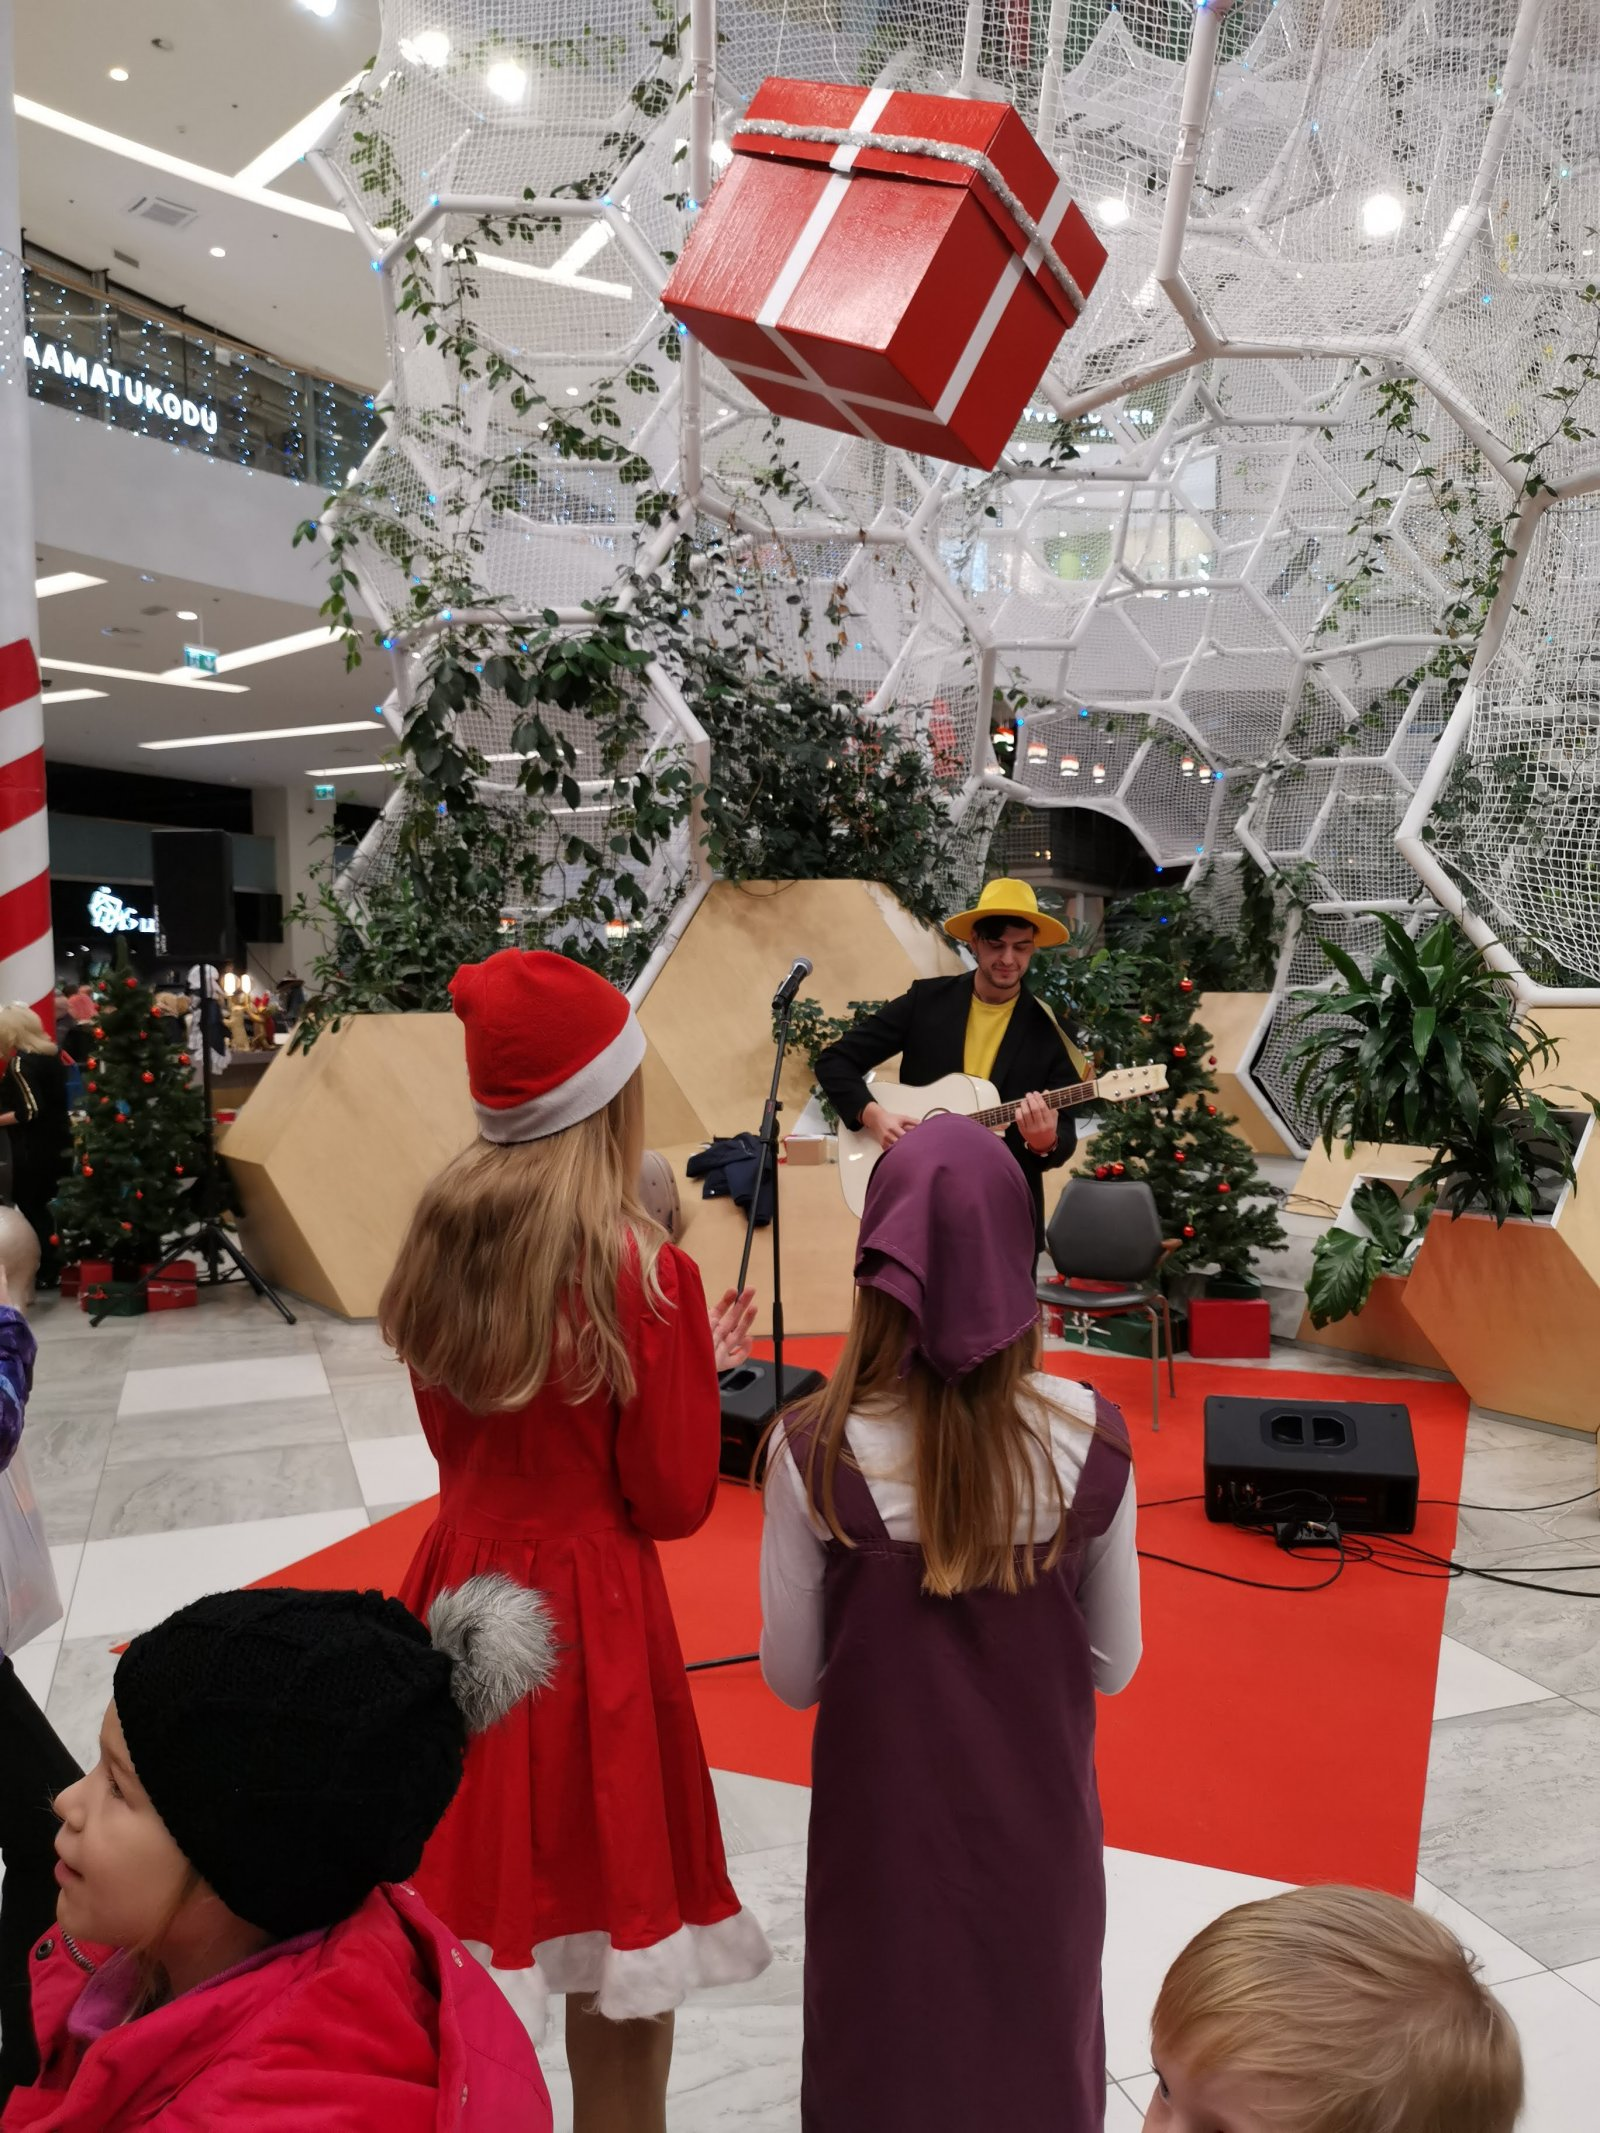 T1 Mall of Tallinn muutub jõulumaaks!: